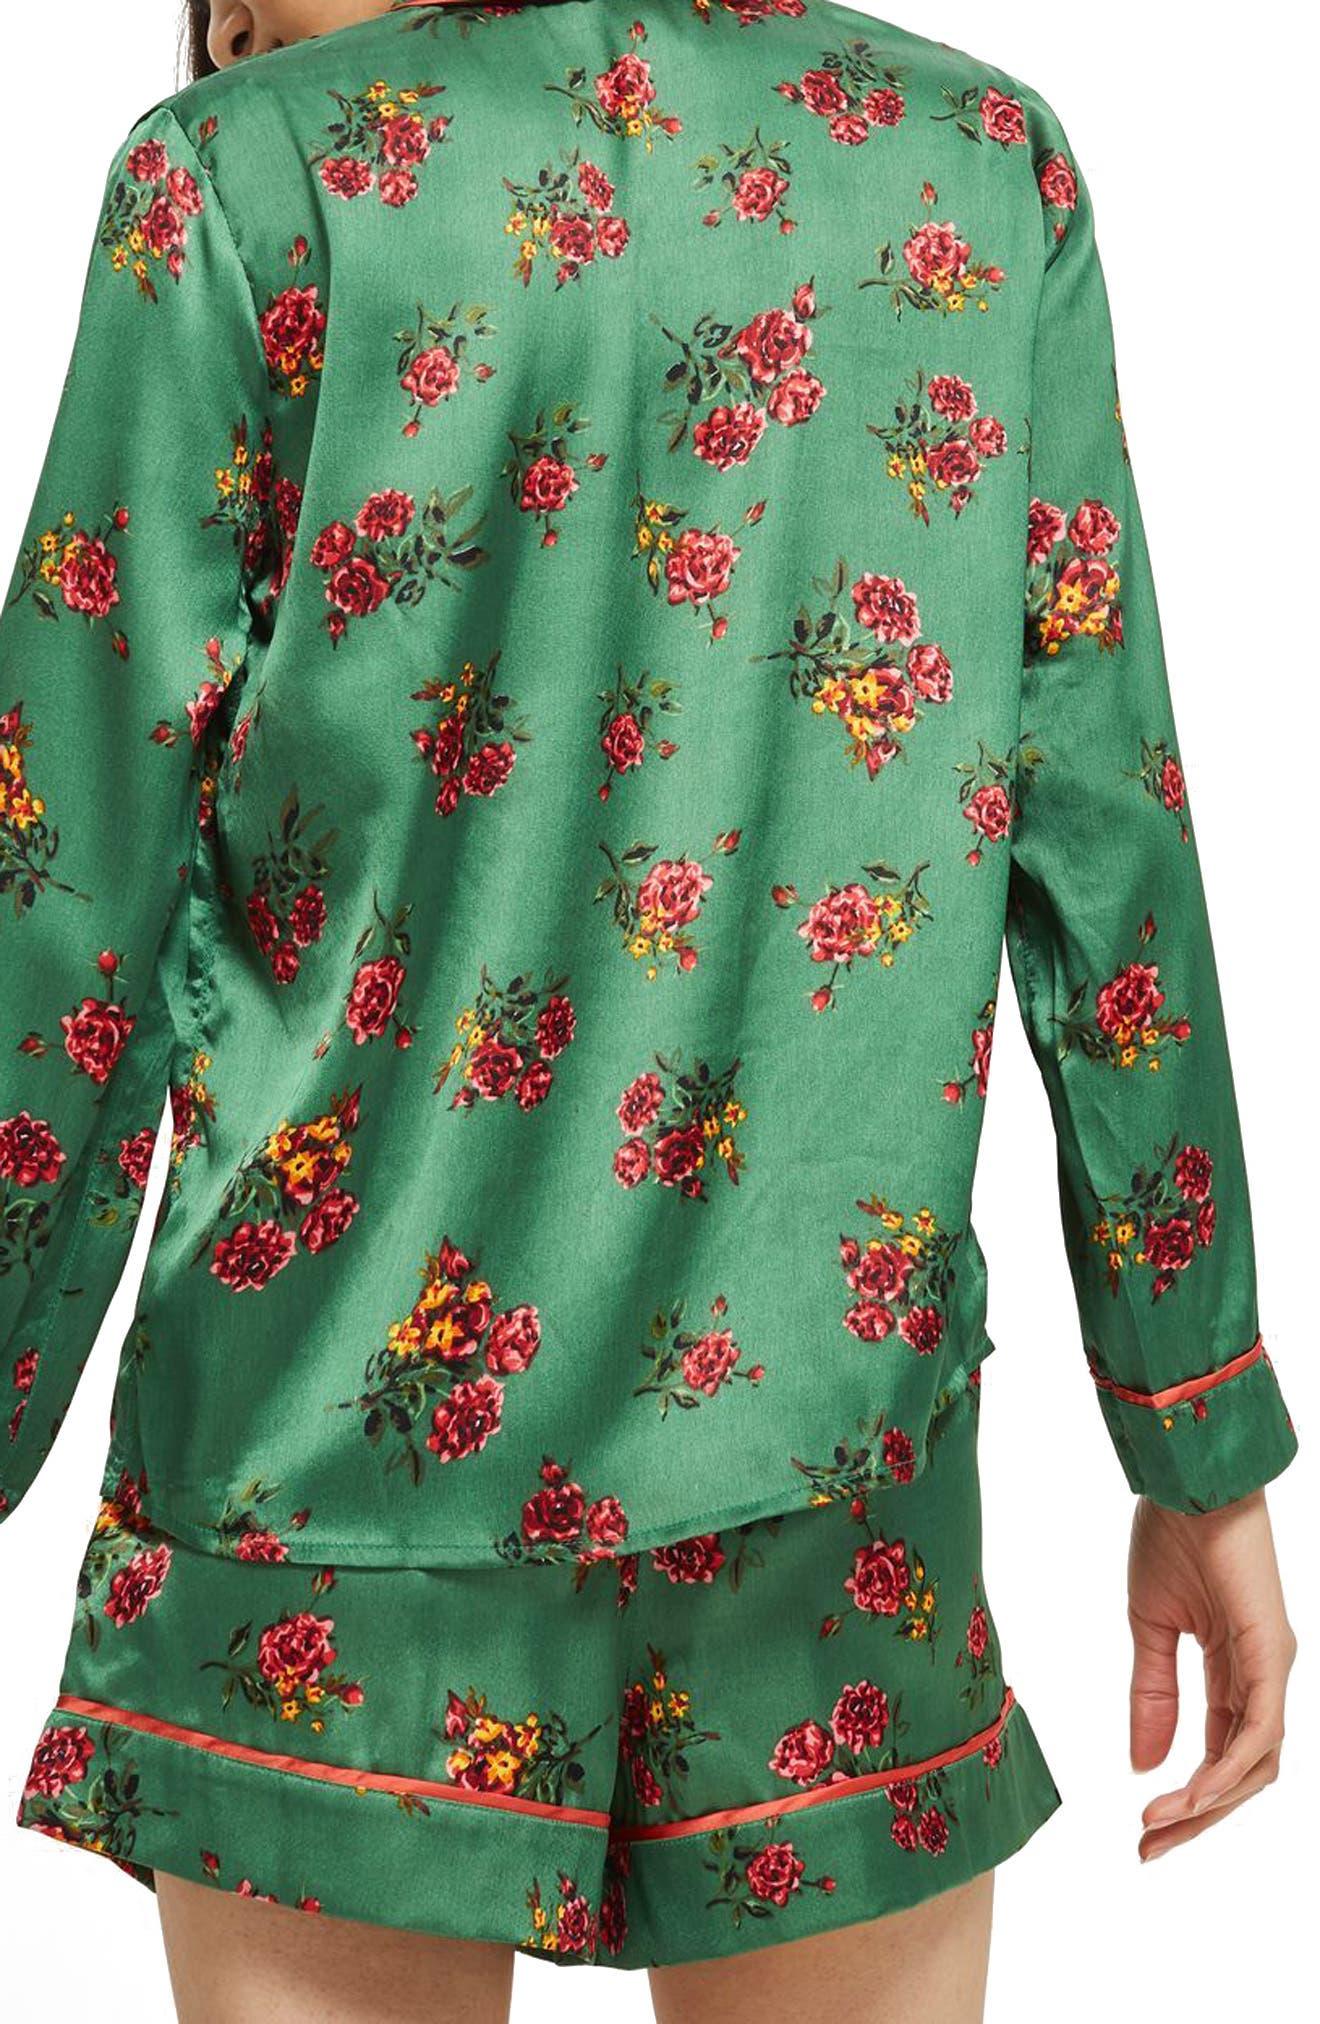 Floral Print Pajama Shirt,                             Alternate thumbnail 2, color,                             Bright Green Multi